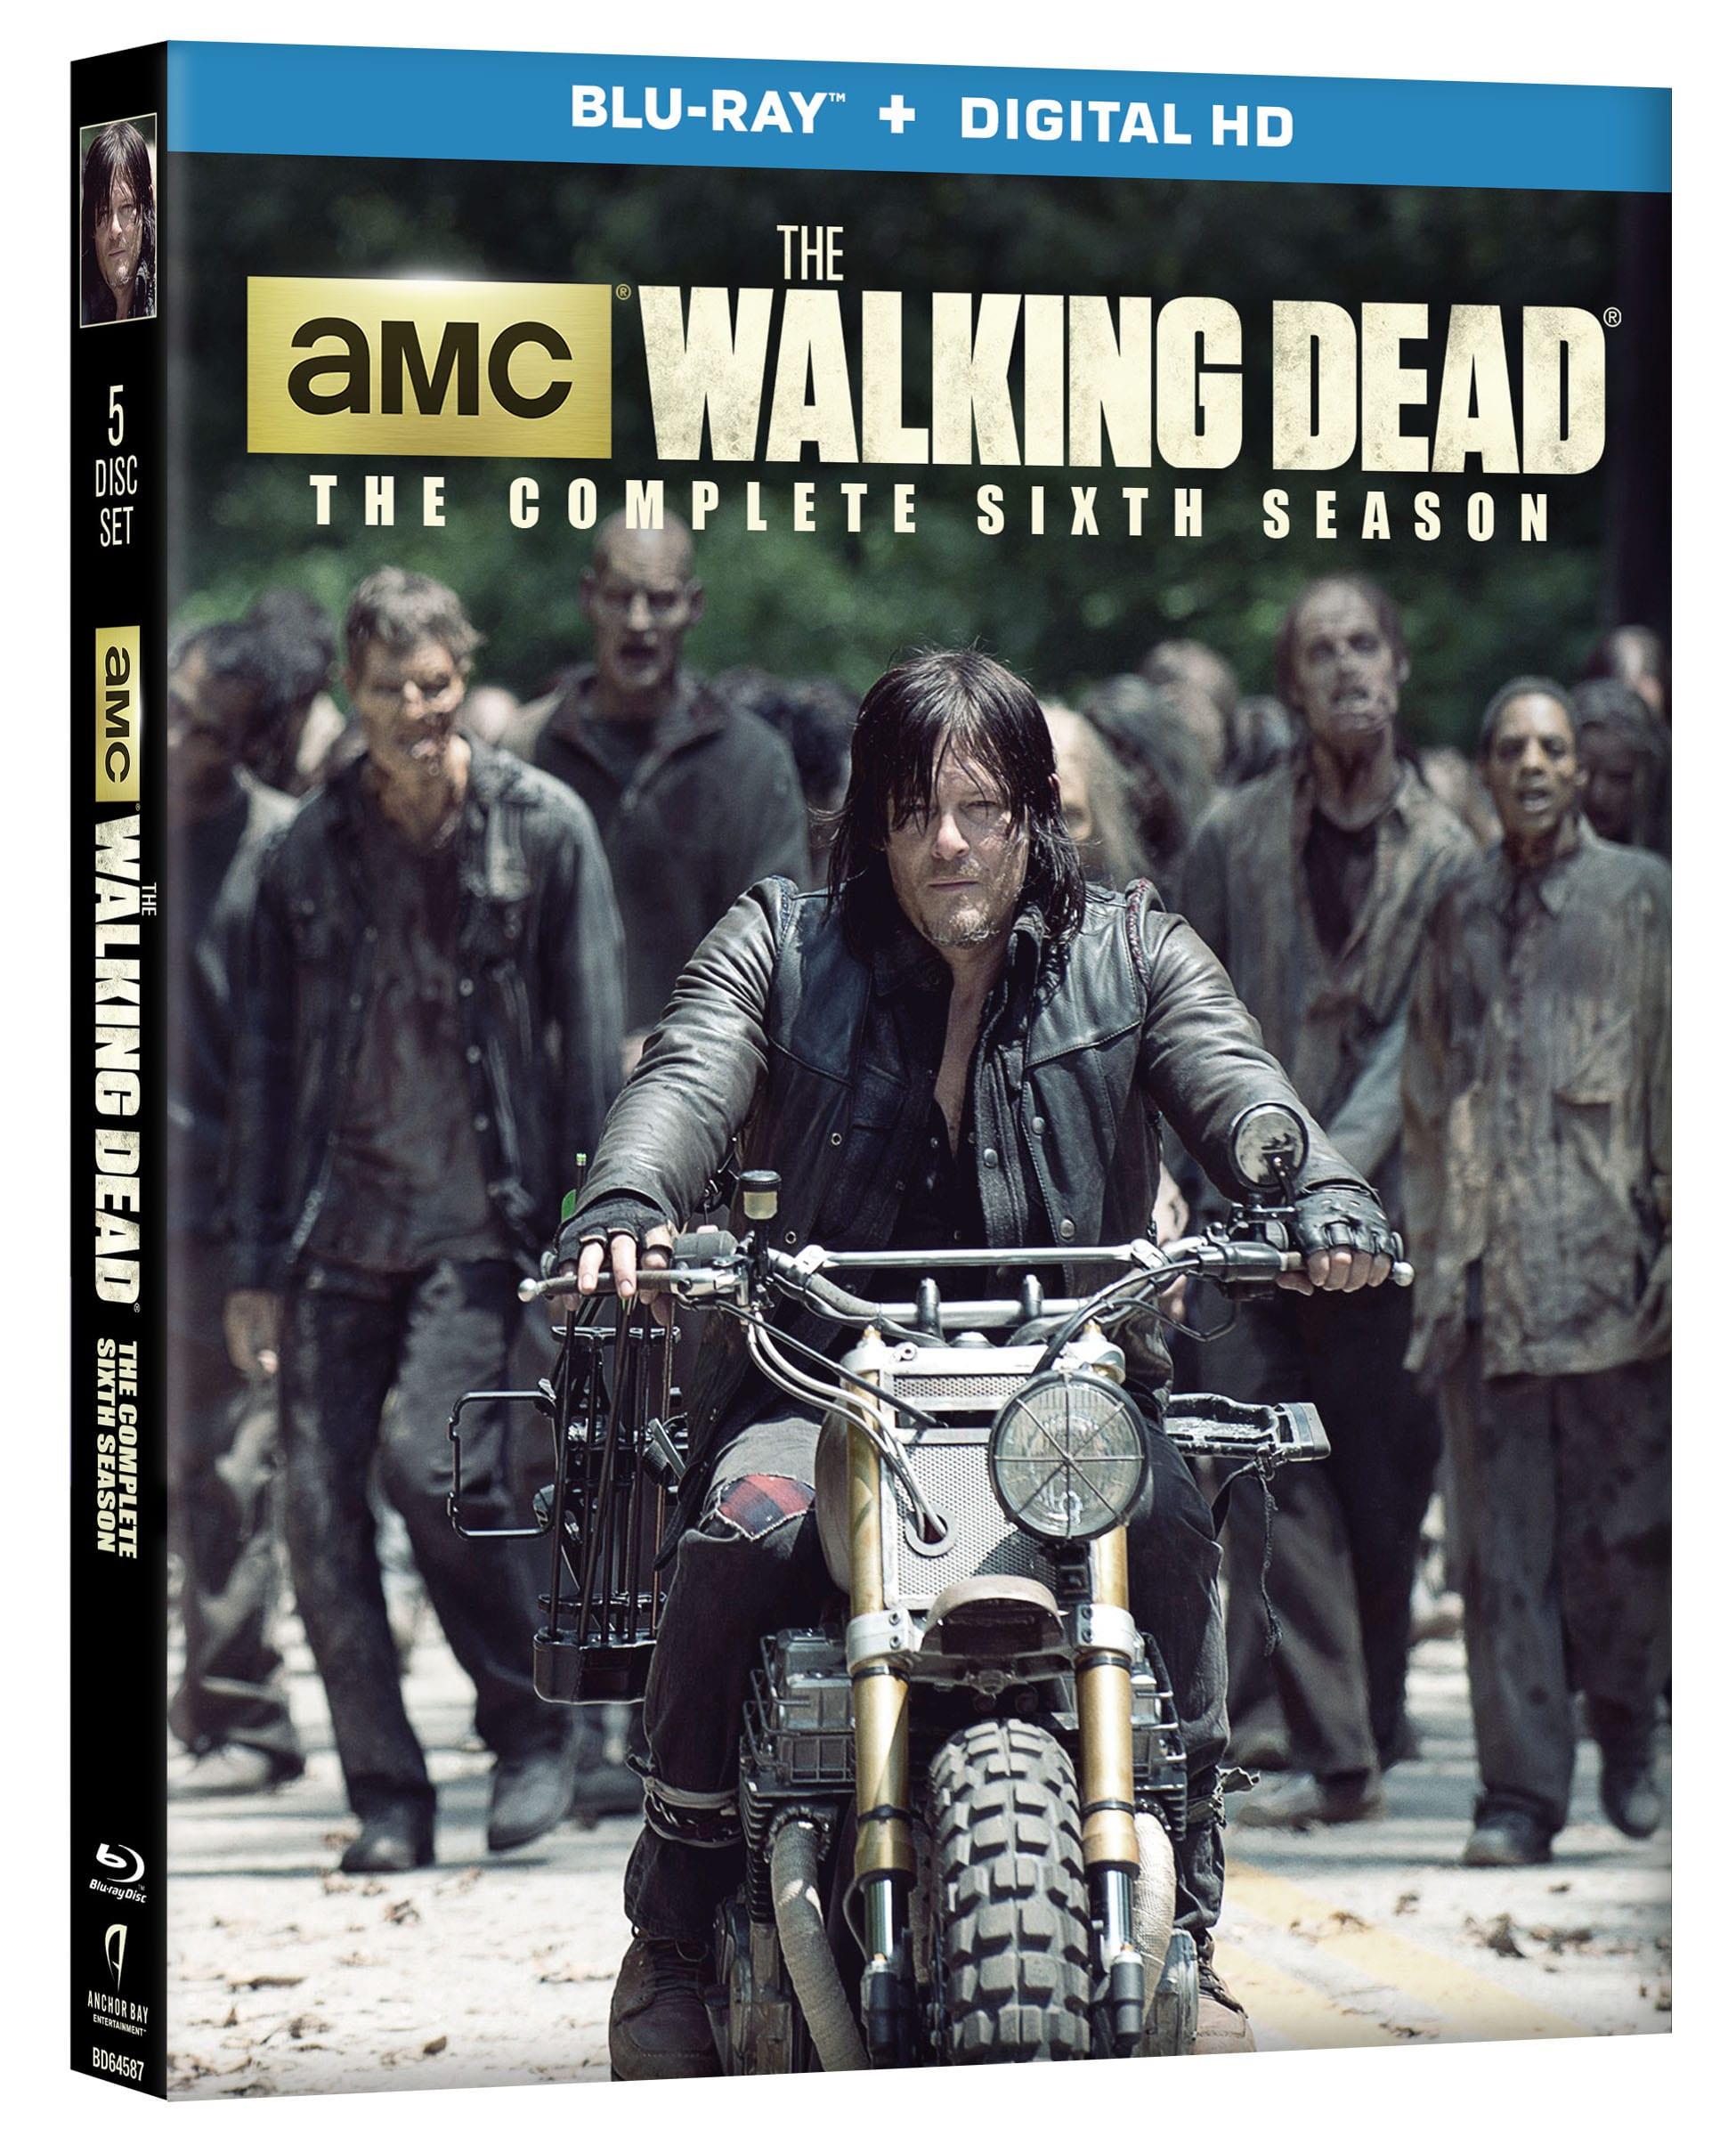 Walking Dead S6 Lenticular 3D